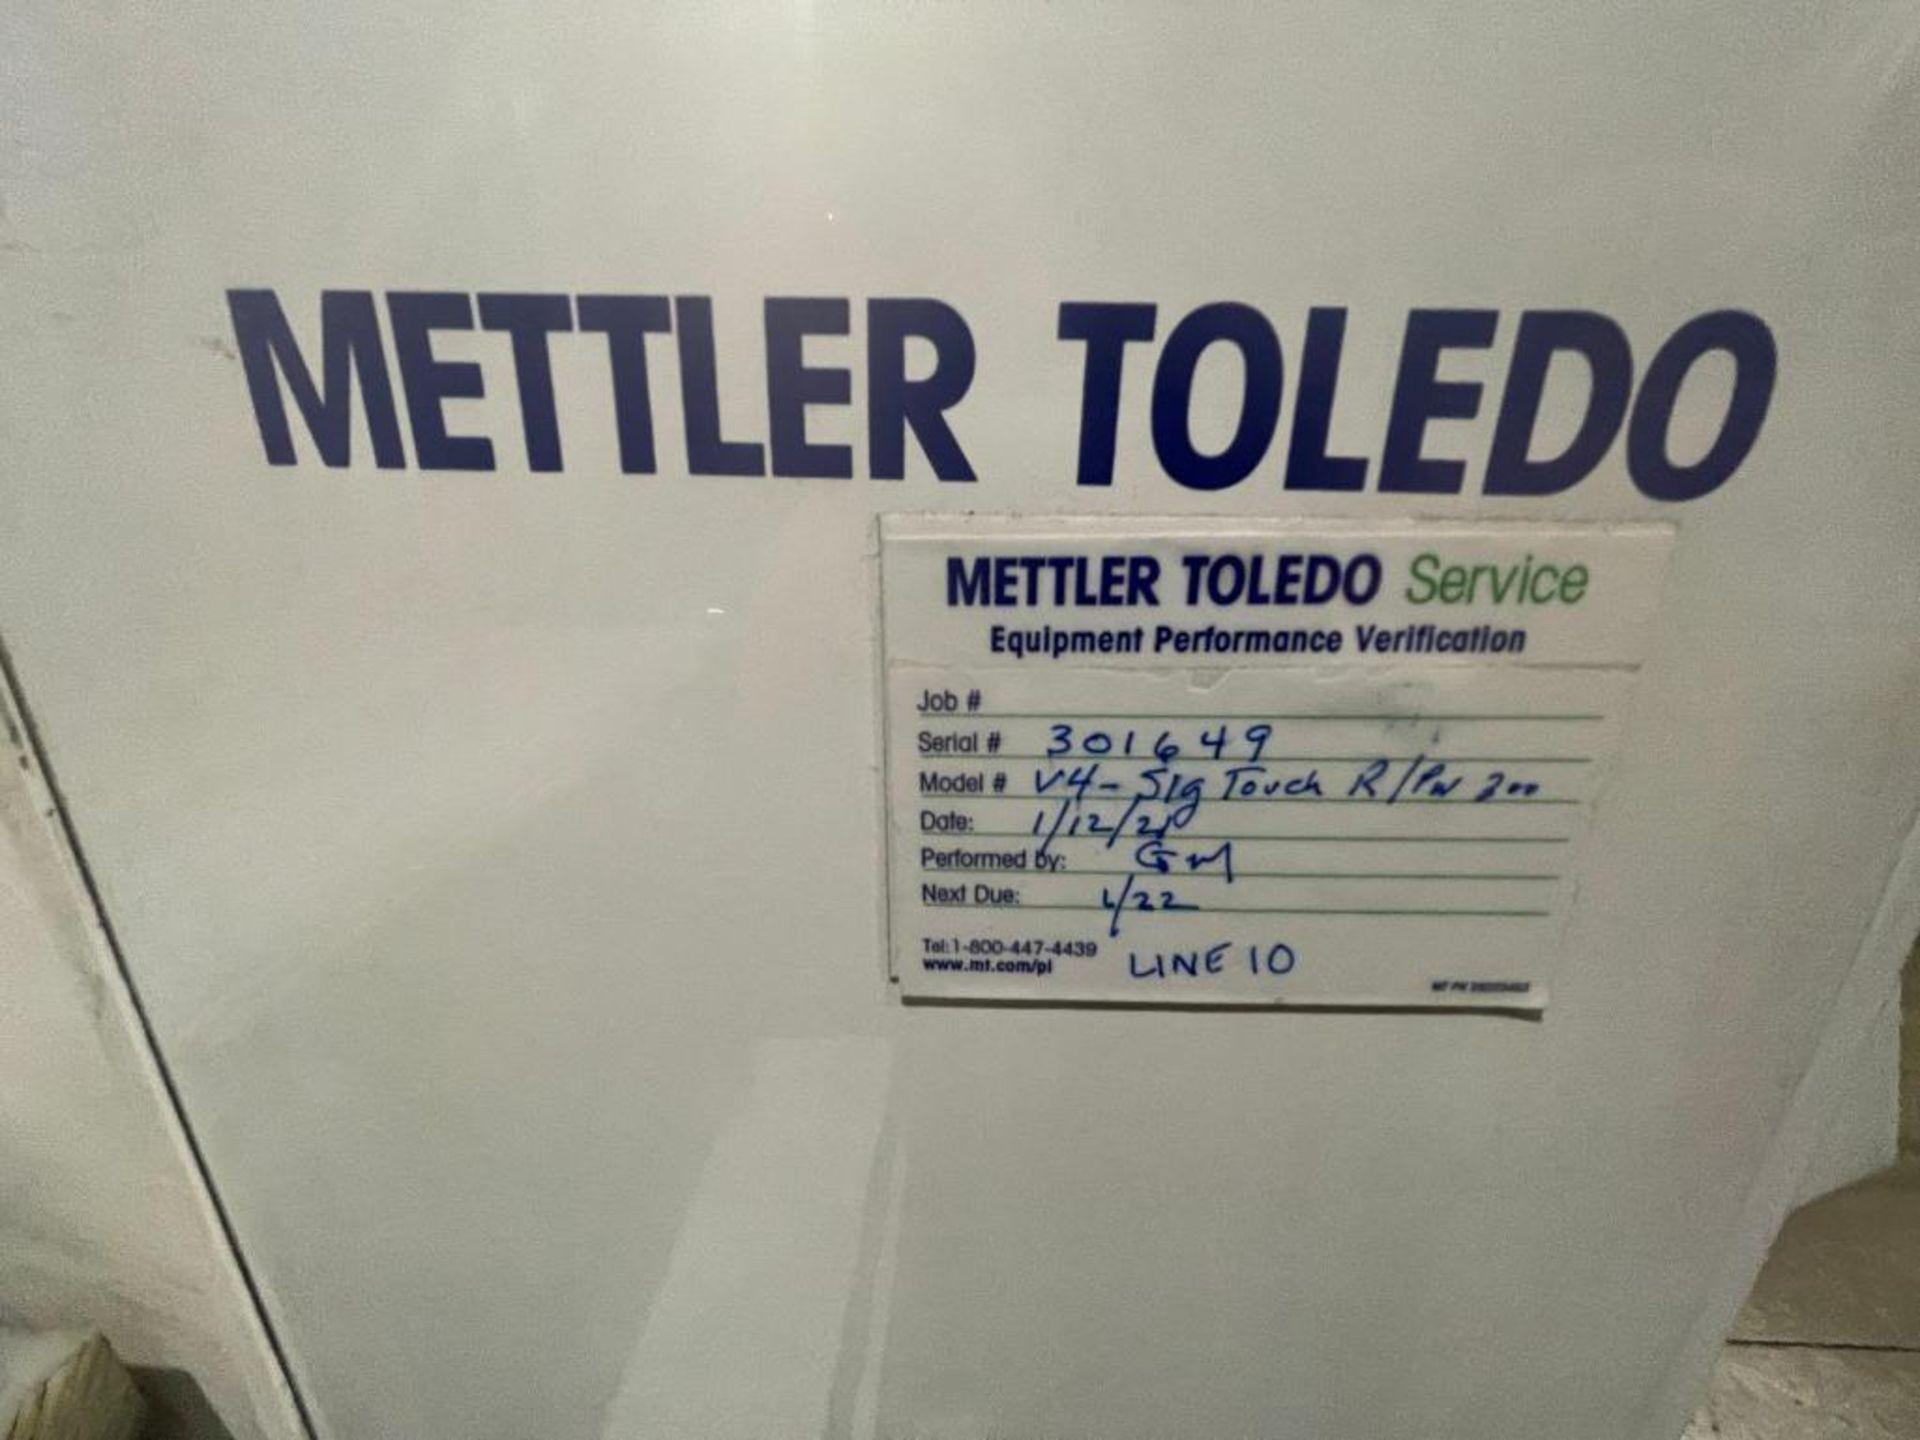 Mettler Toledo metal detector, model V4-1 - Image 2 of 10